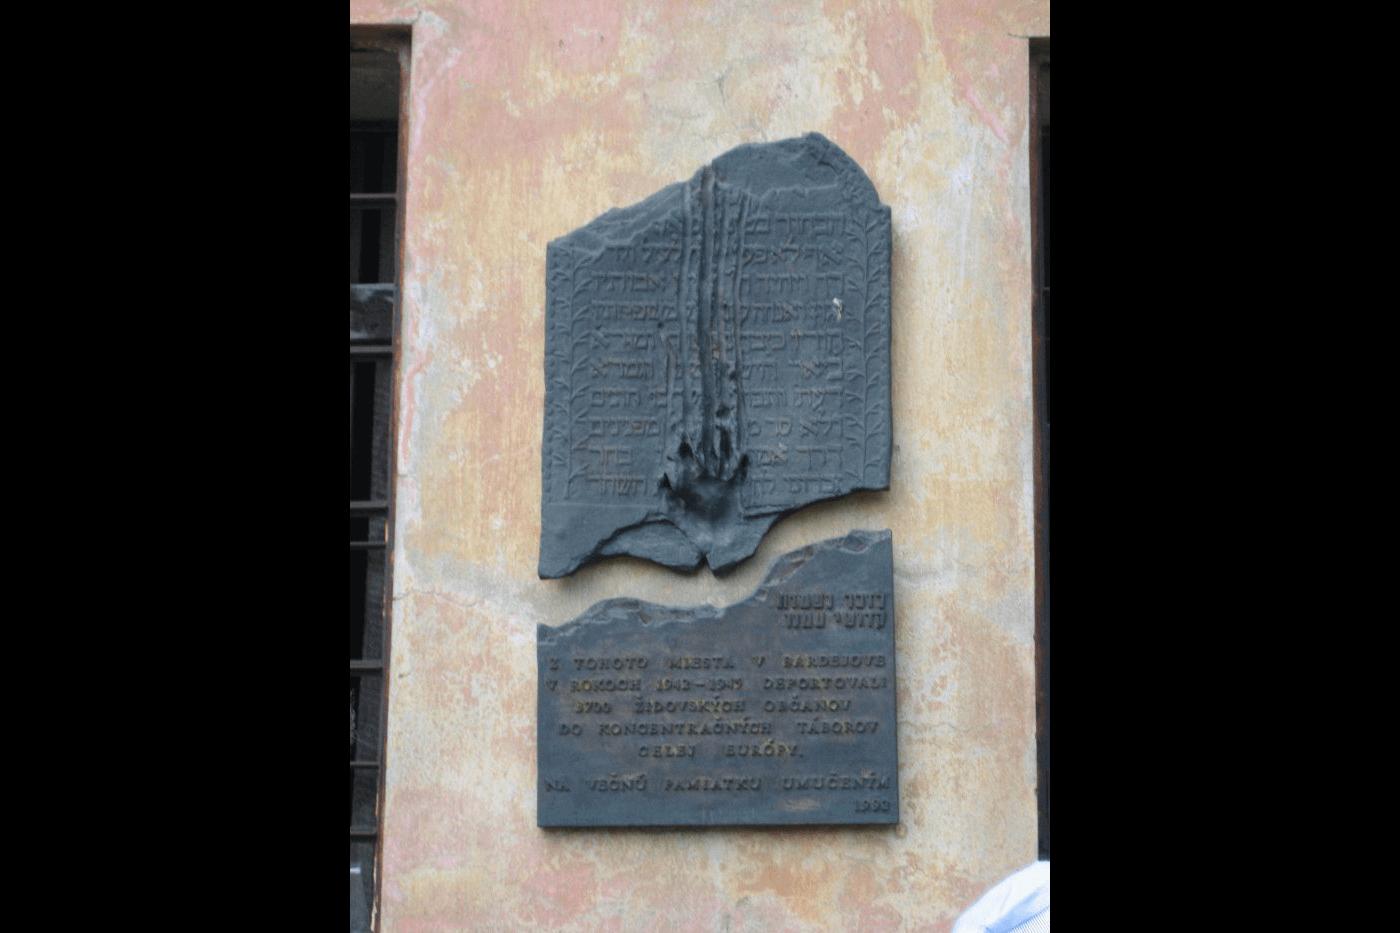 Mikvah Memorial Plaque, 2006